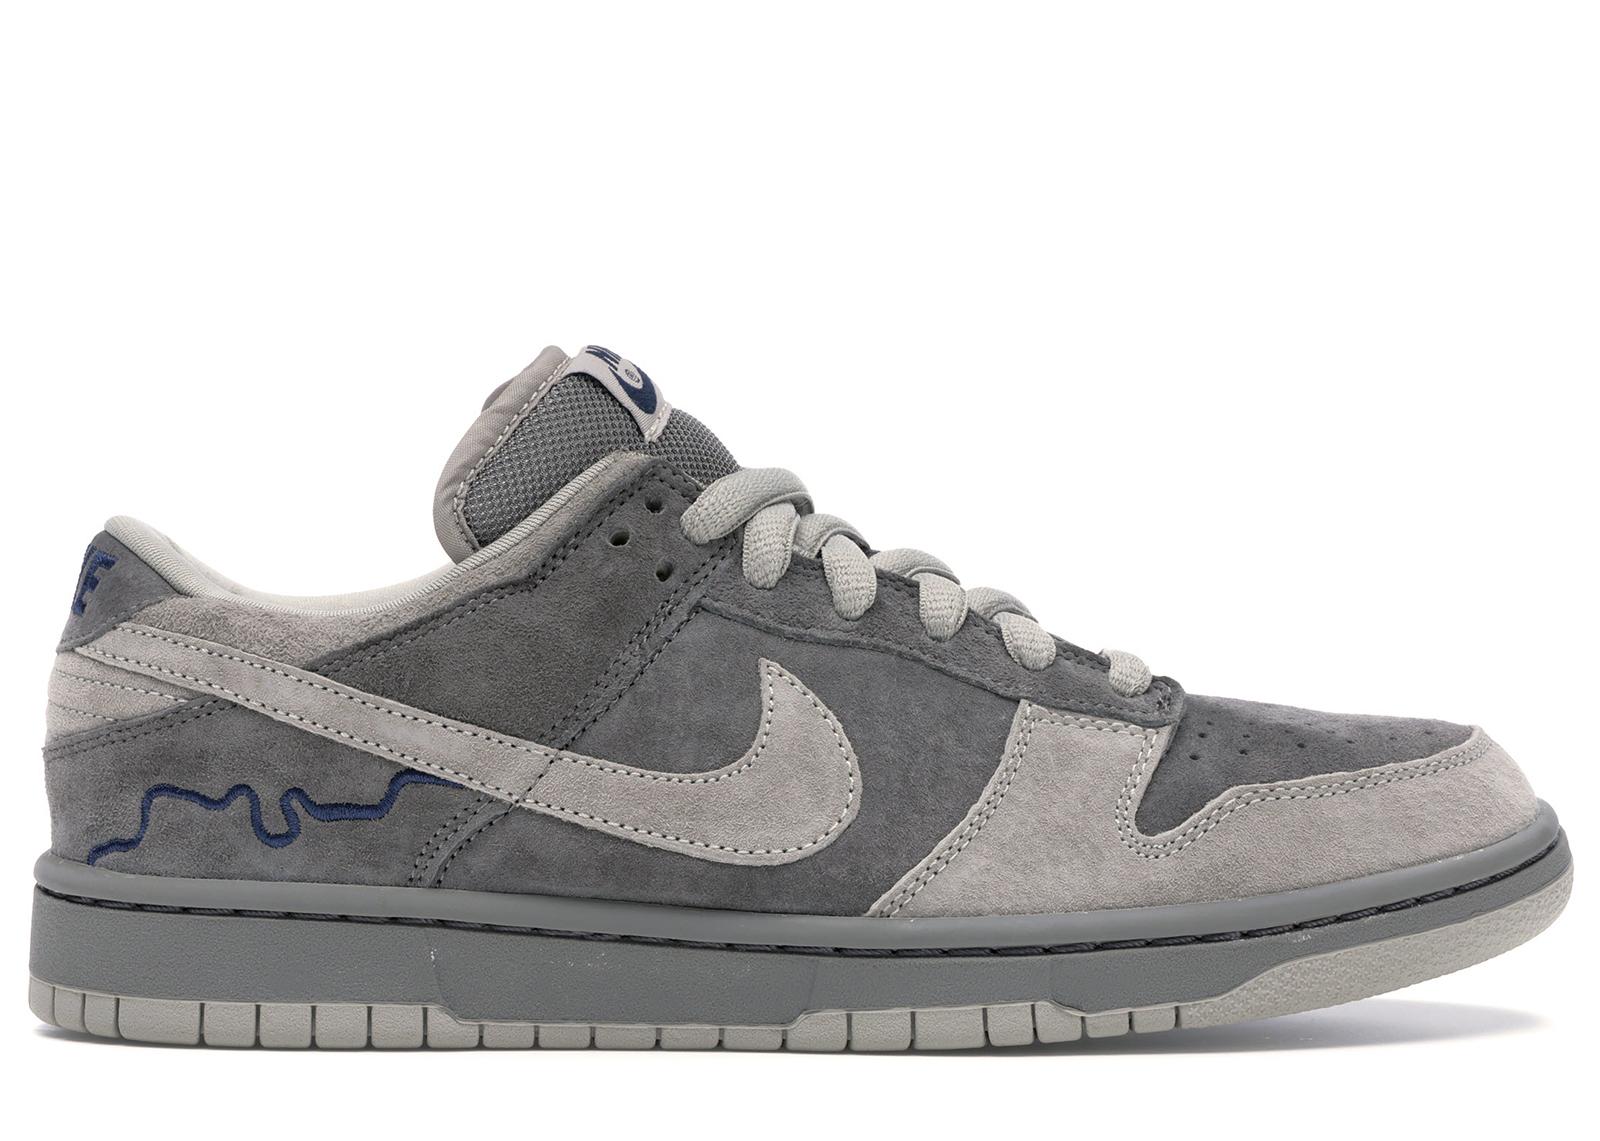 Nike SB Dunk Low London - 308269-111